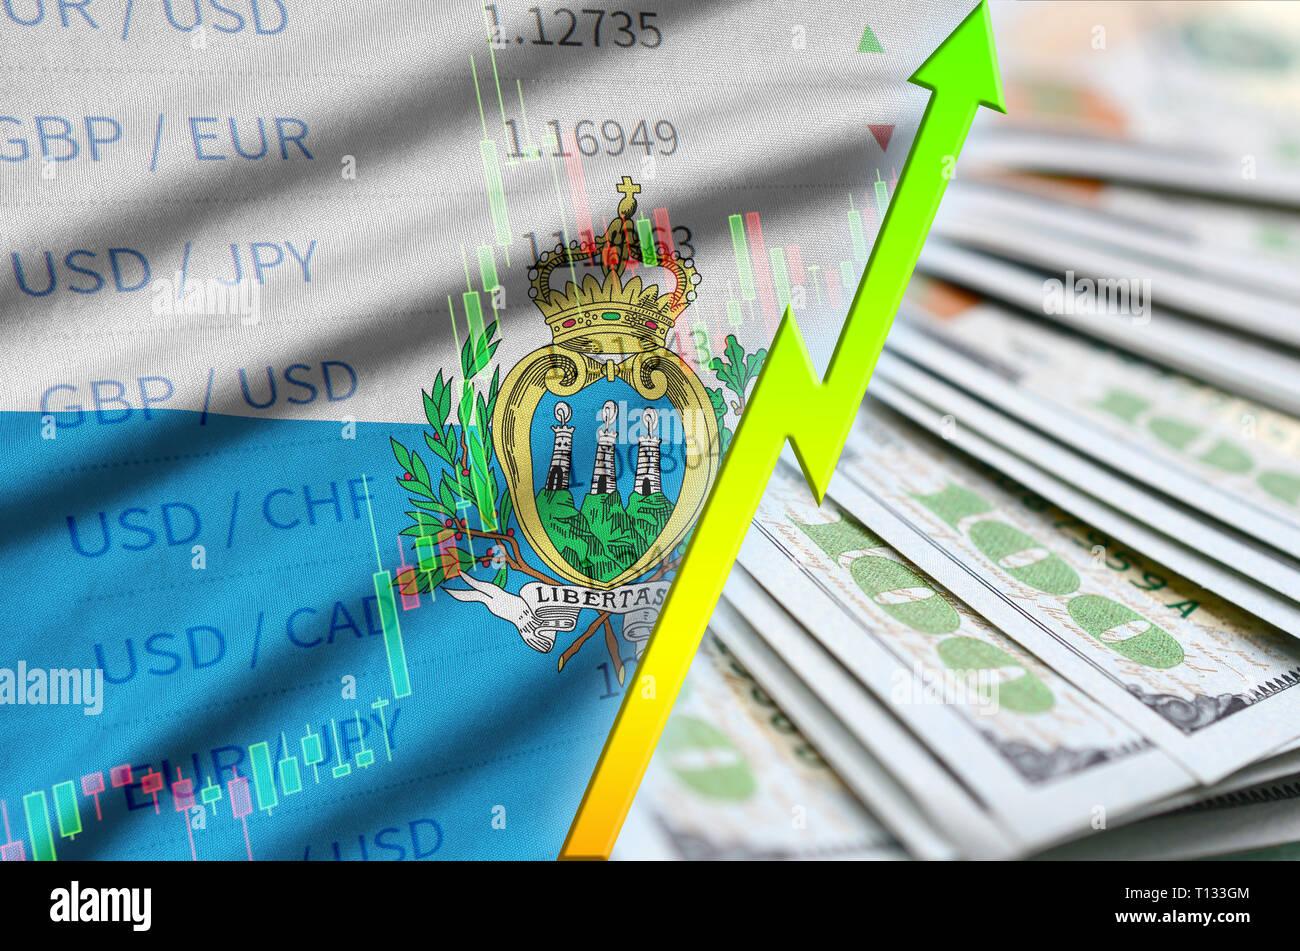 San Marino Flag Wavy Flag Stockfotos & San Marino Flag Wavy ...